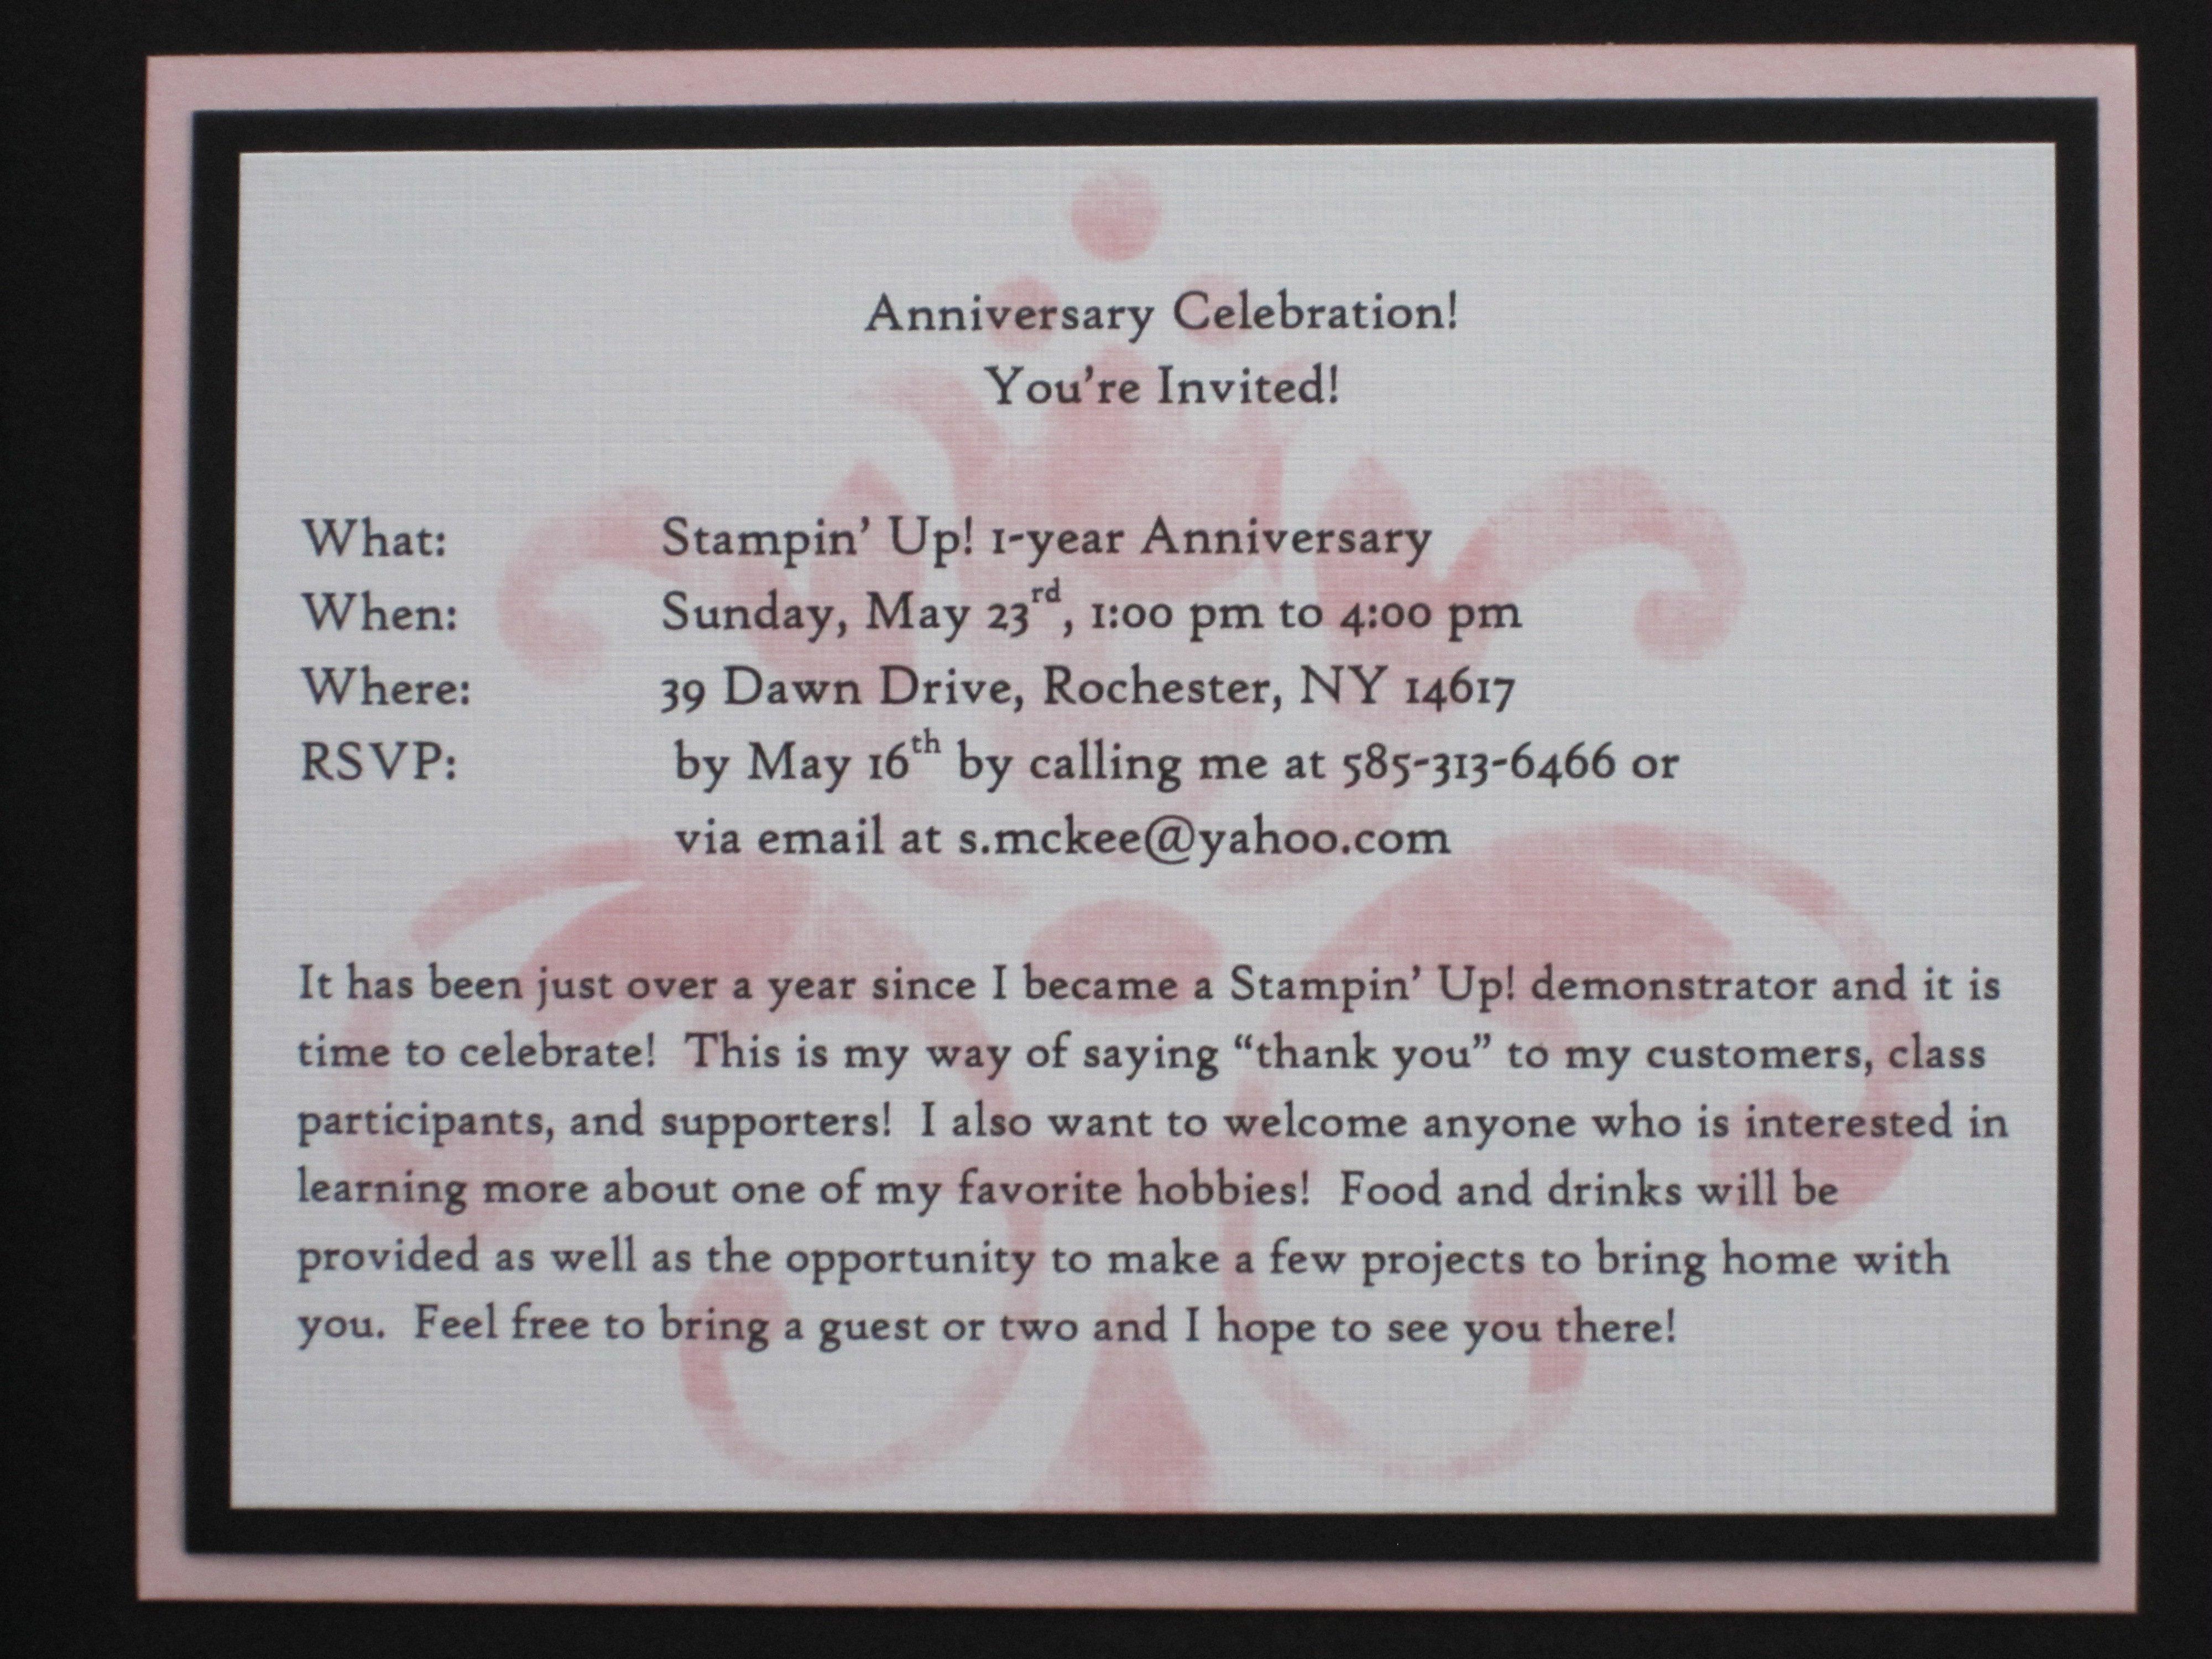 Company Anniversary Invitation Wording Samples